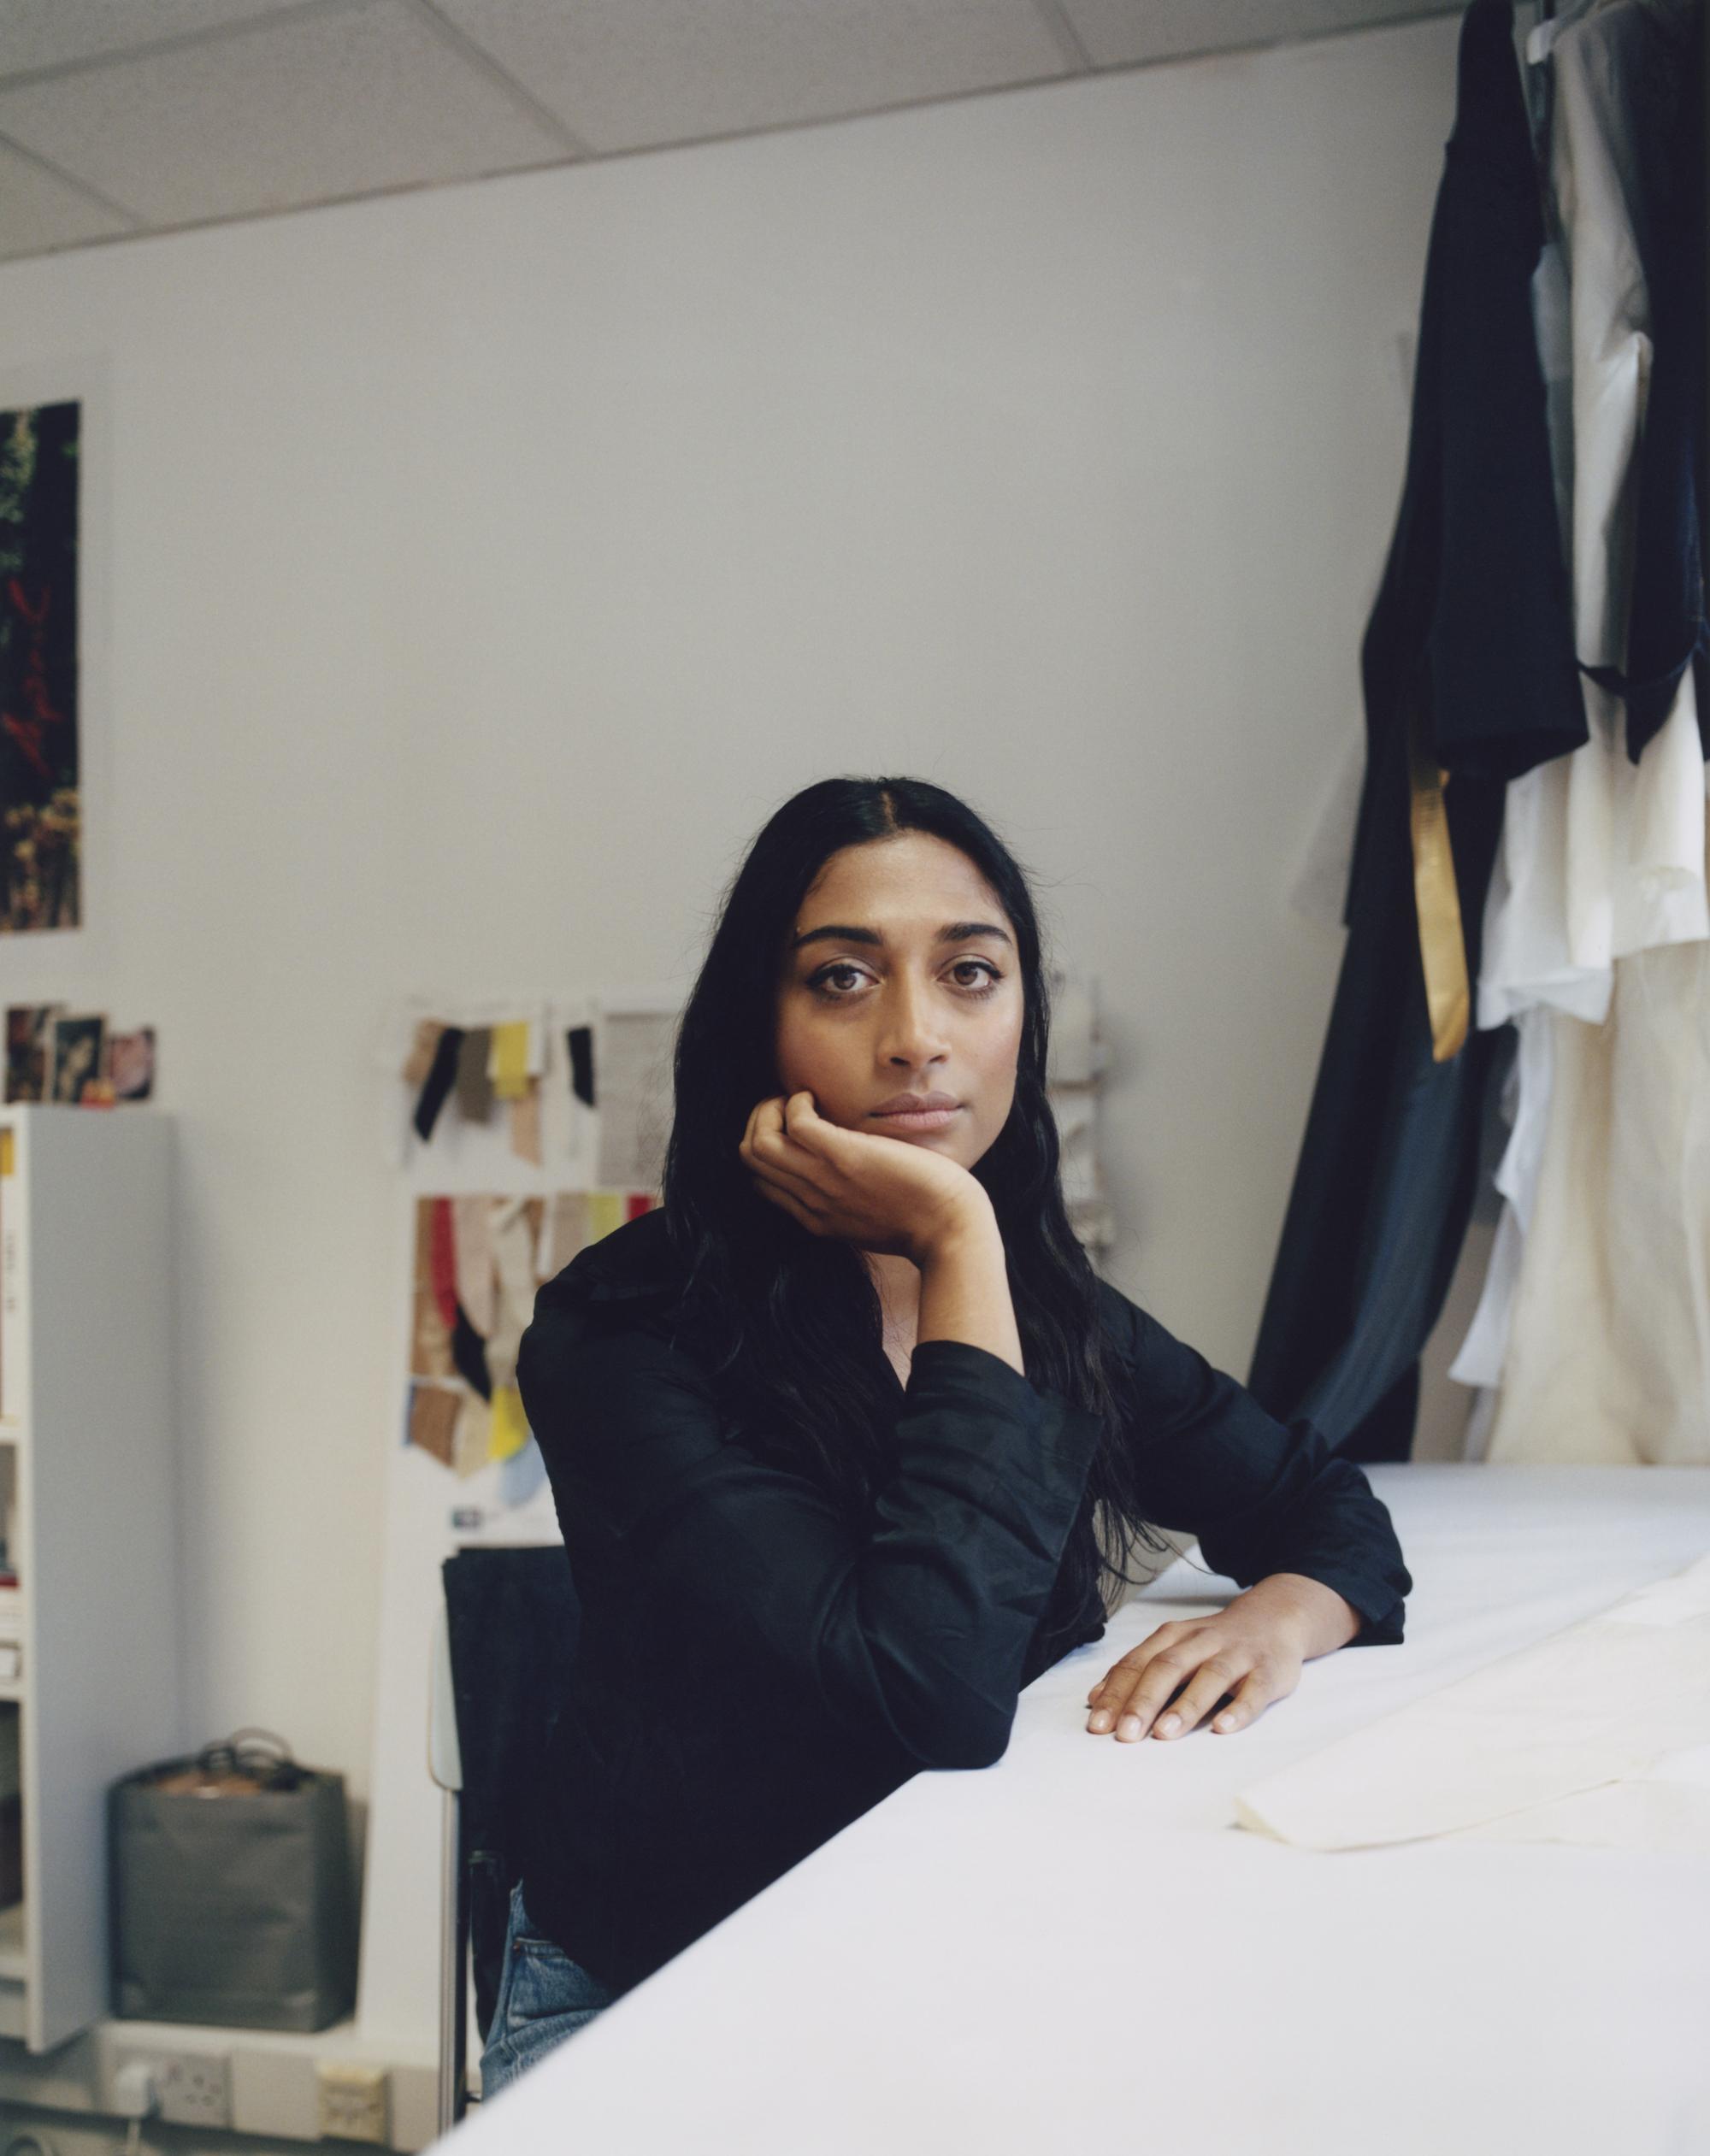 Supriya Lele photographed by Will Grundy